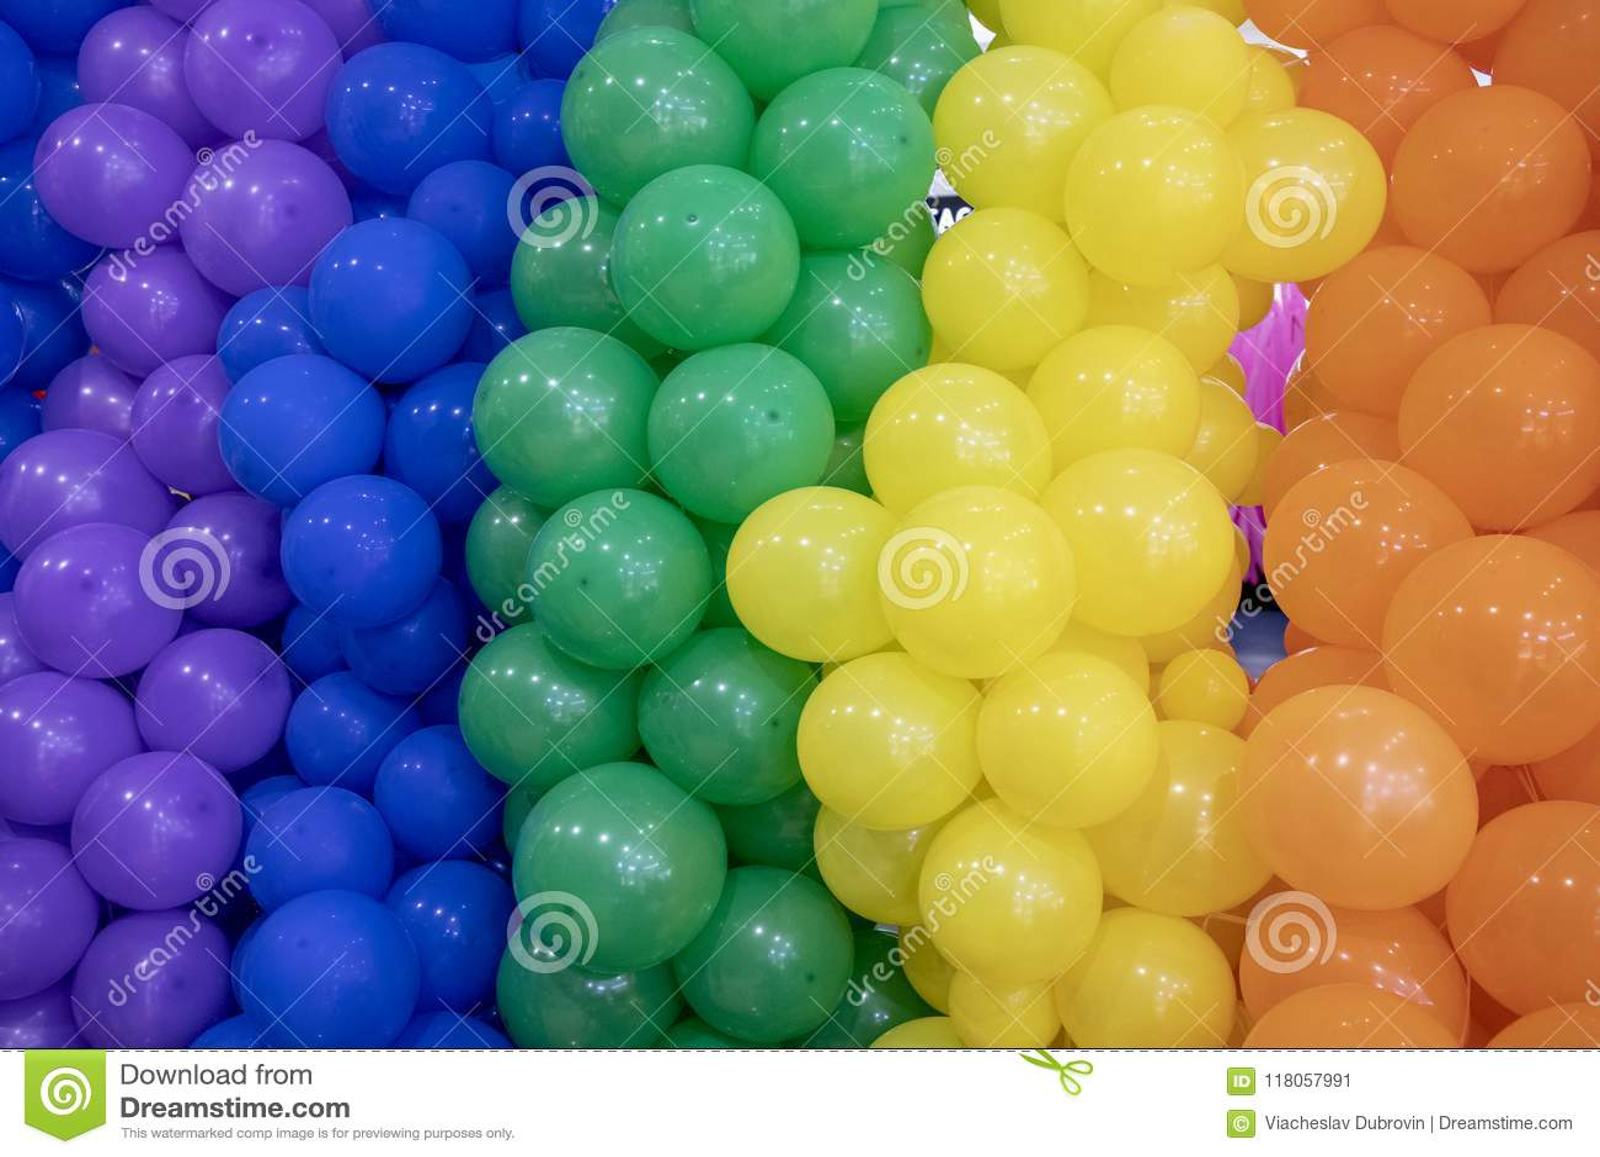 Colorful Air Balloon Wall Closeup Photo. Vivid Party Balloon ...